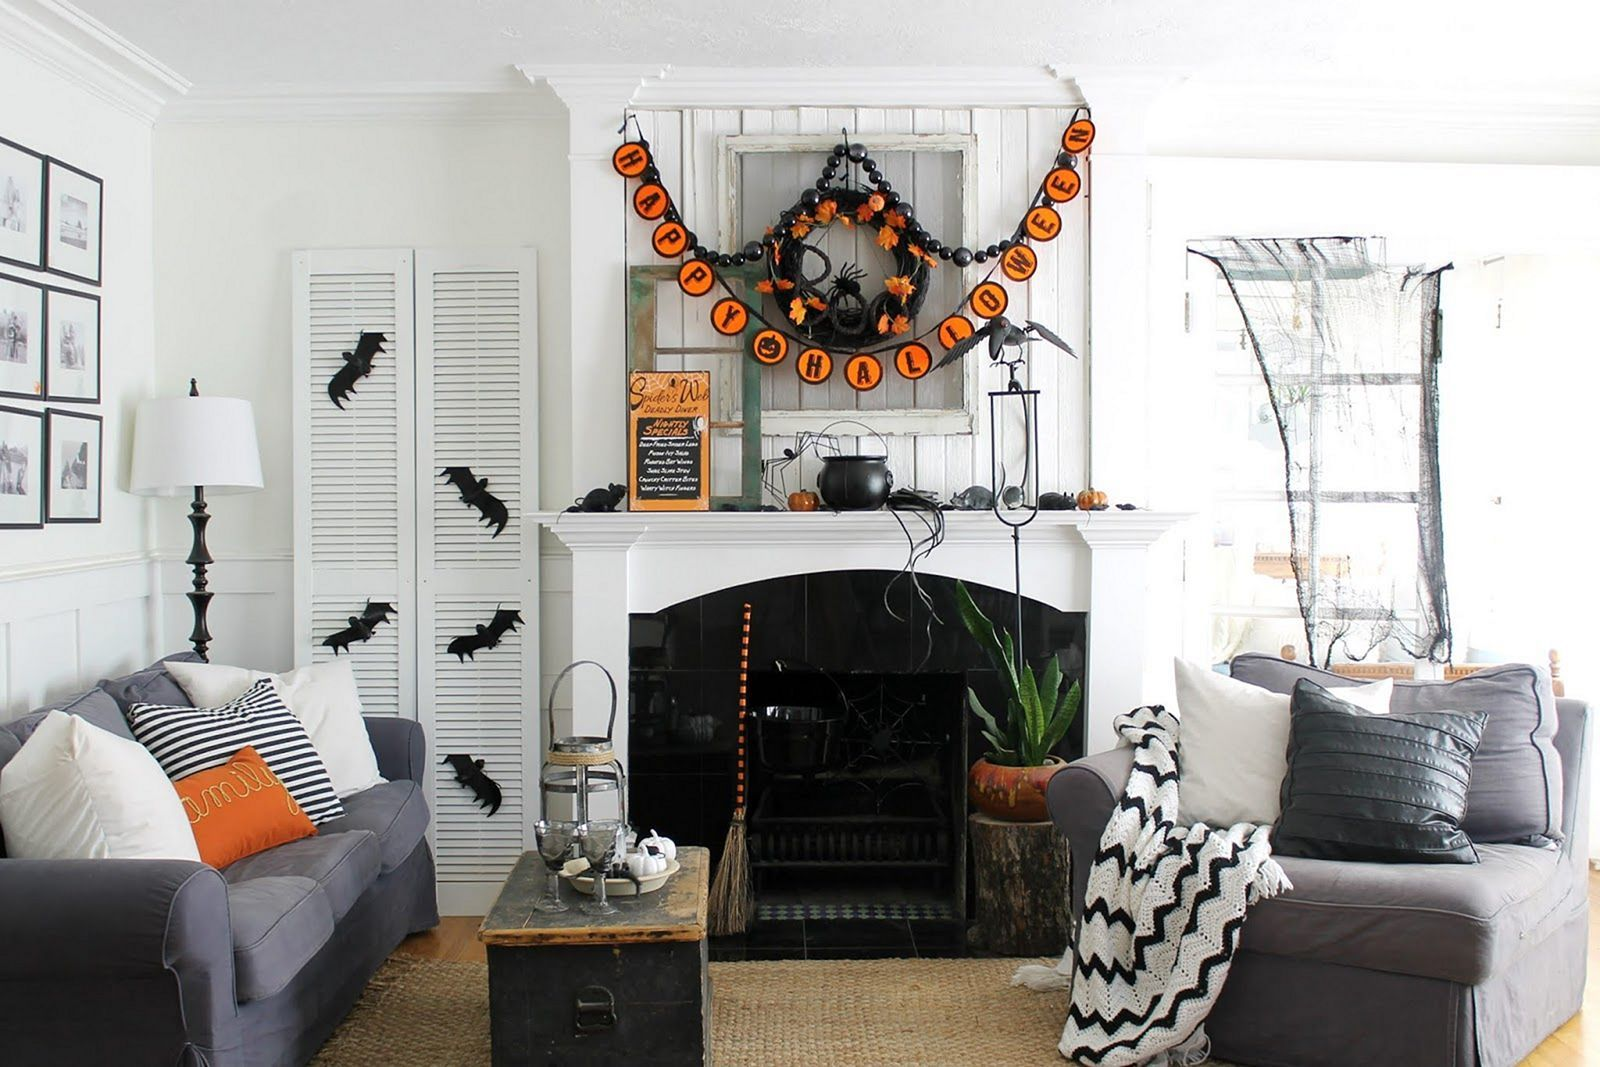 17 Easy And Simple Diy Living Room Halloween Decoration Ideas Halloween Living Room Living Room Diy Wicker House Living room halloween decorations